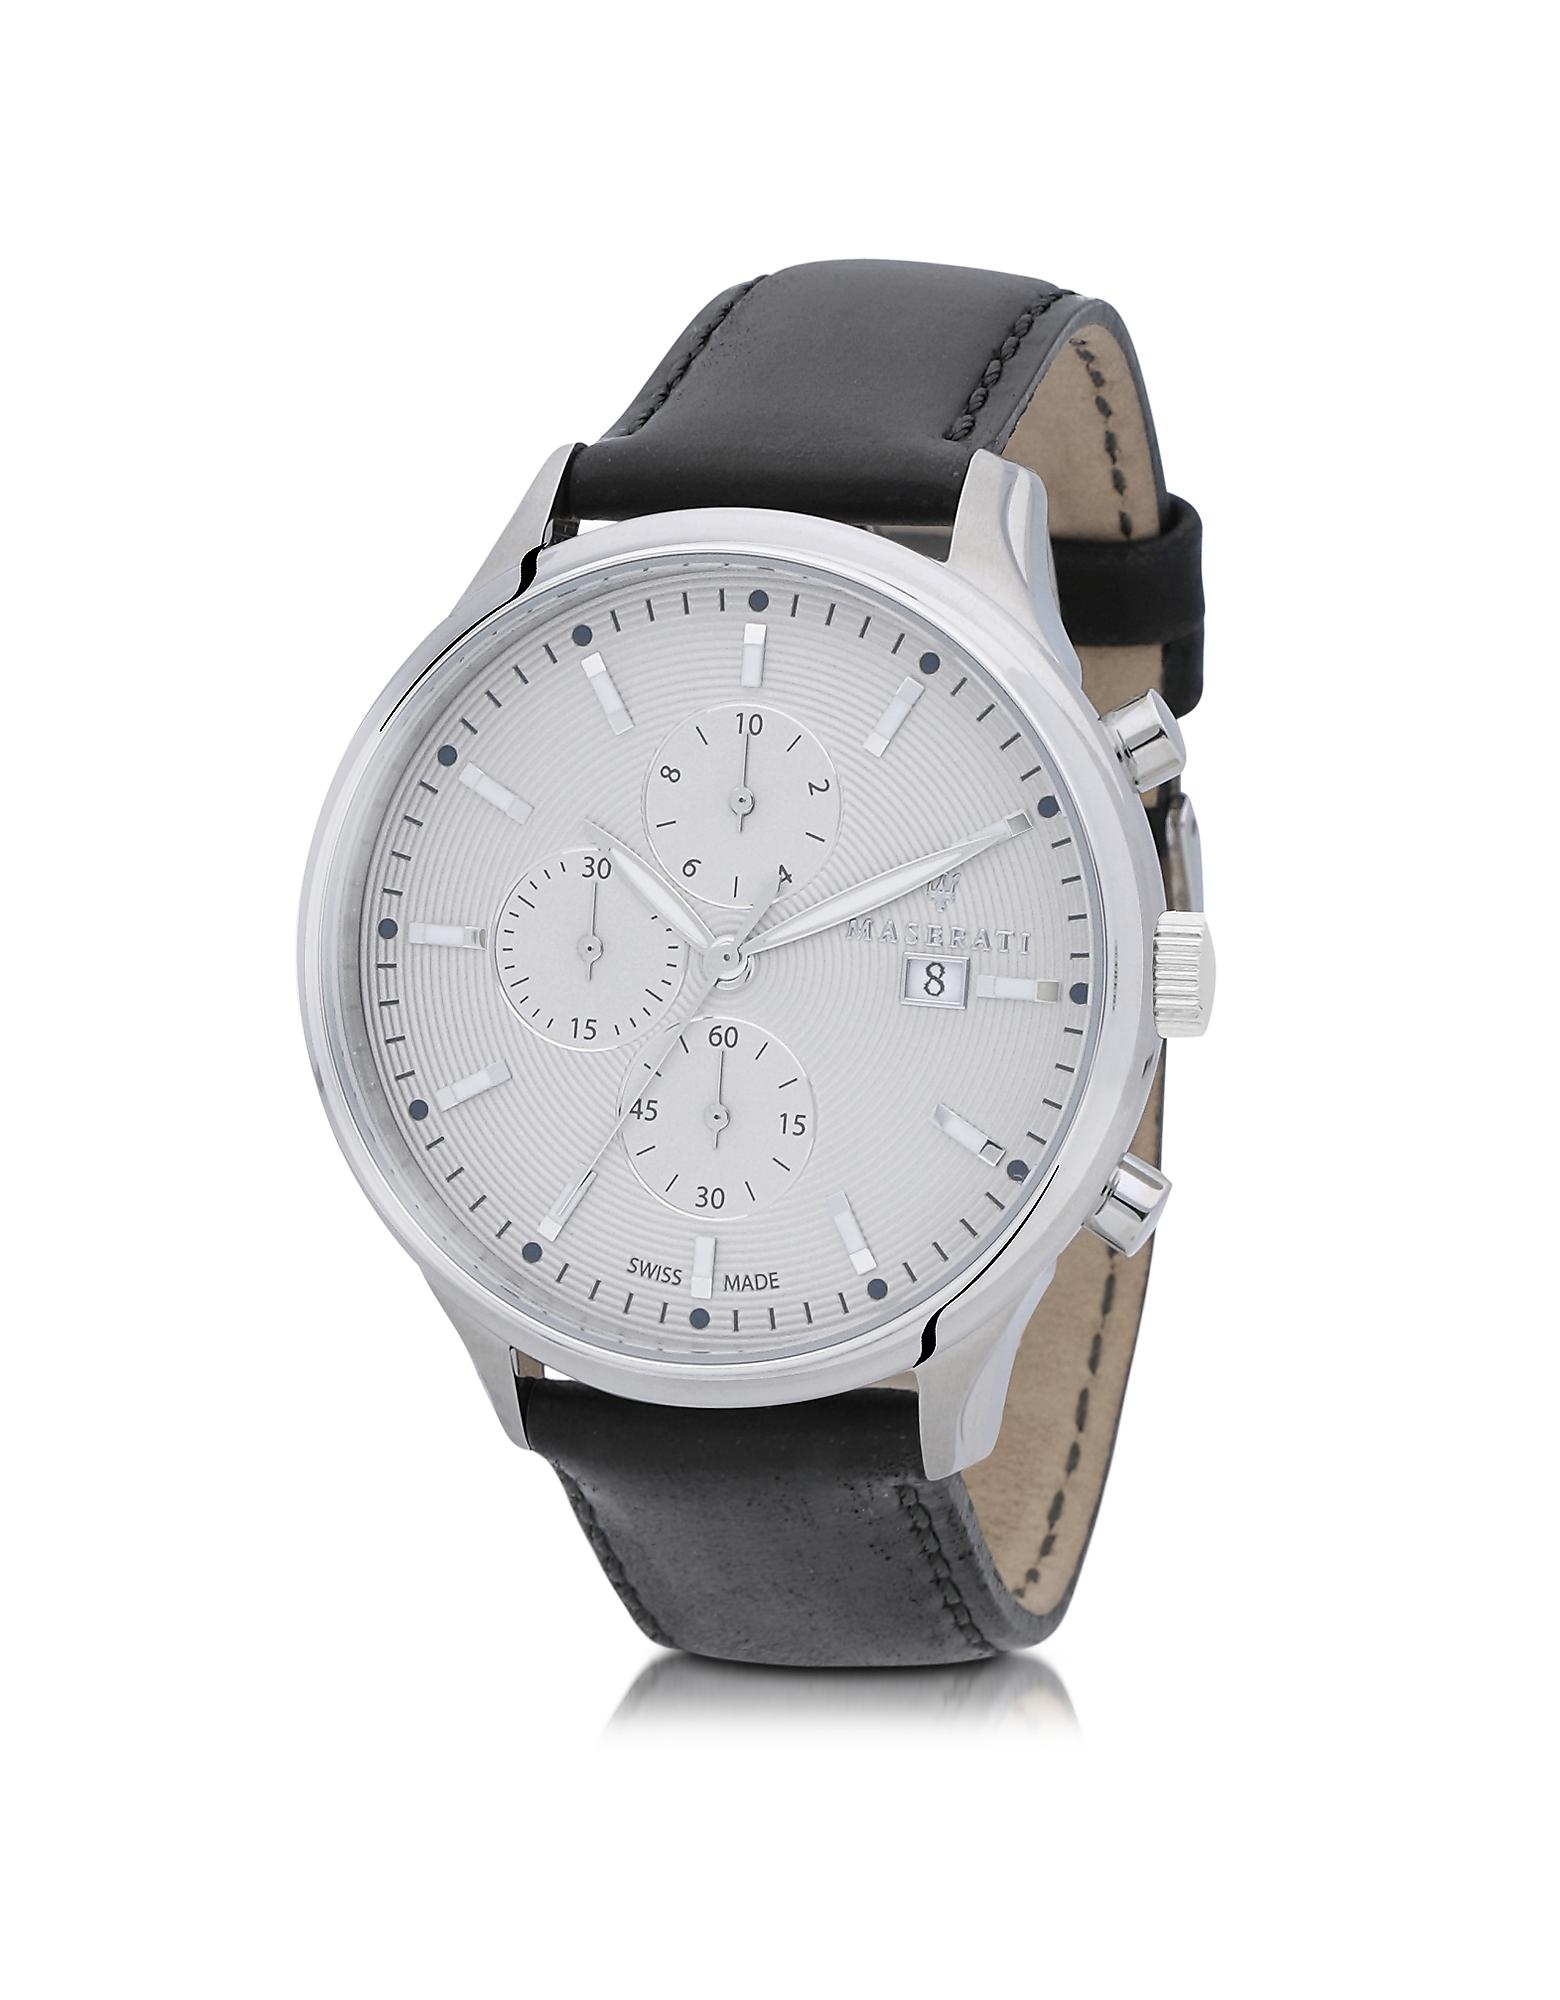 Maserati Men's Watches, Attrazione Silver Tone Stainless Steel Case and Black Leather Strap Men's Ch